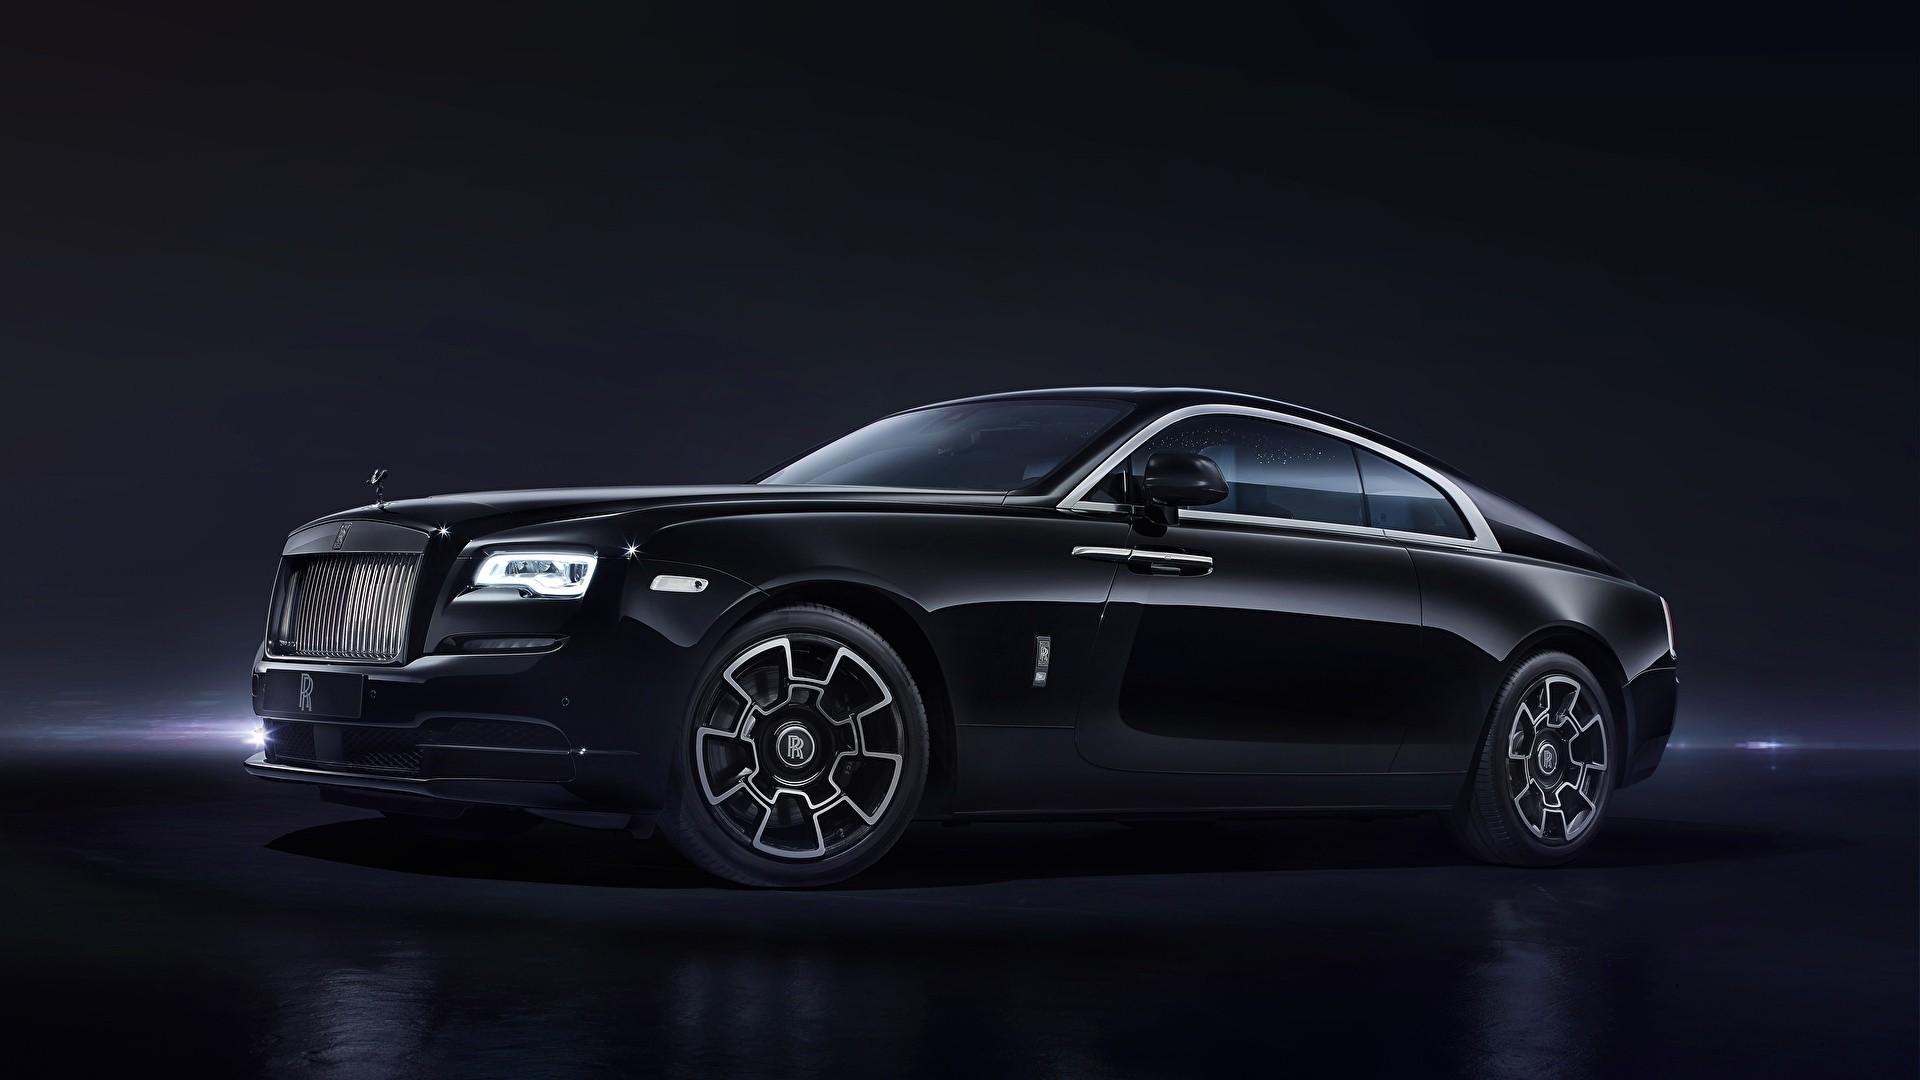 Rolls Royce Wraith a wallpaper